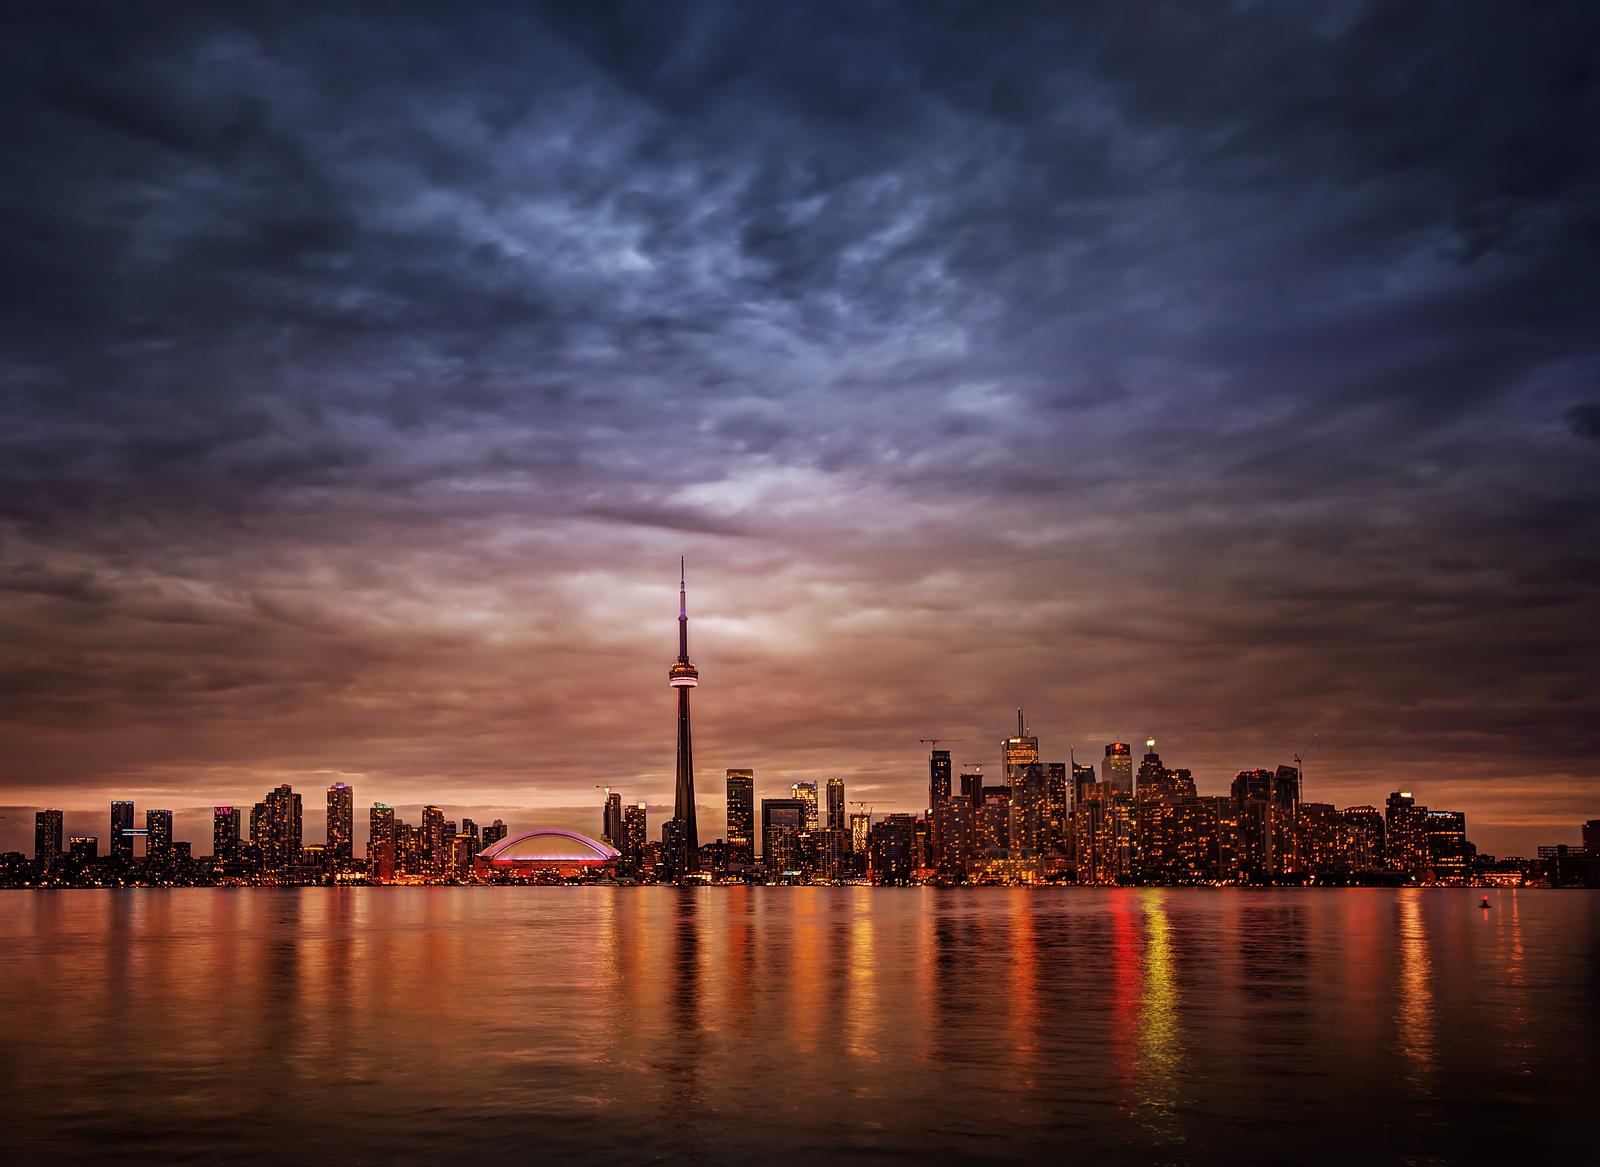 Great Night in Toronto